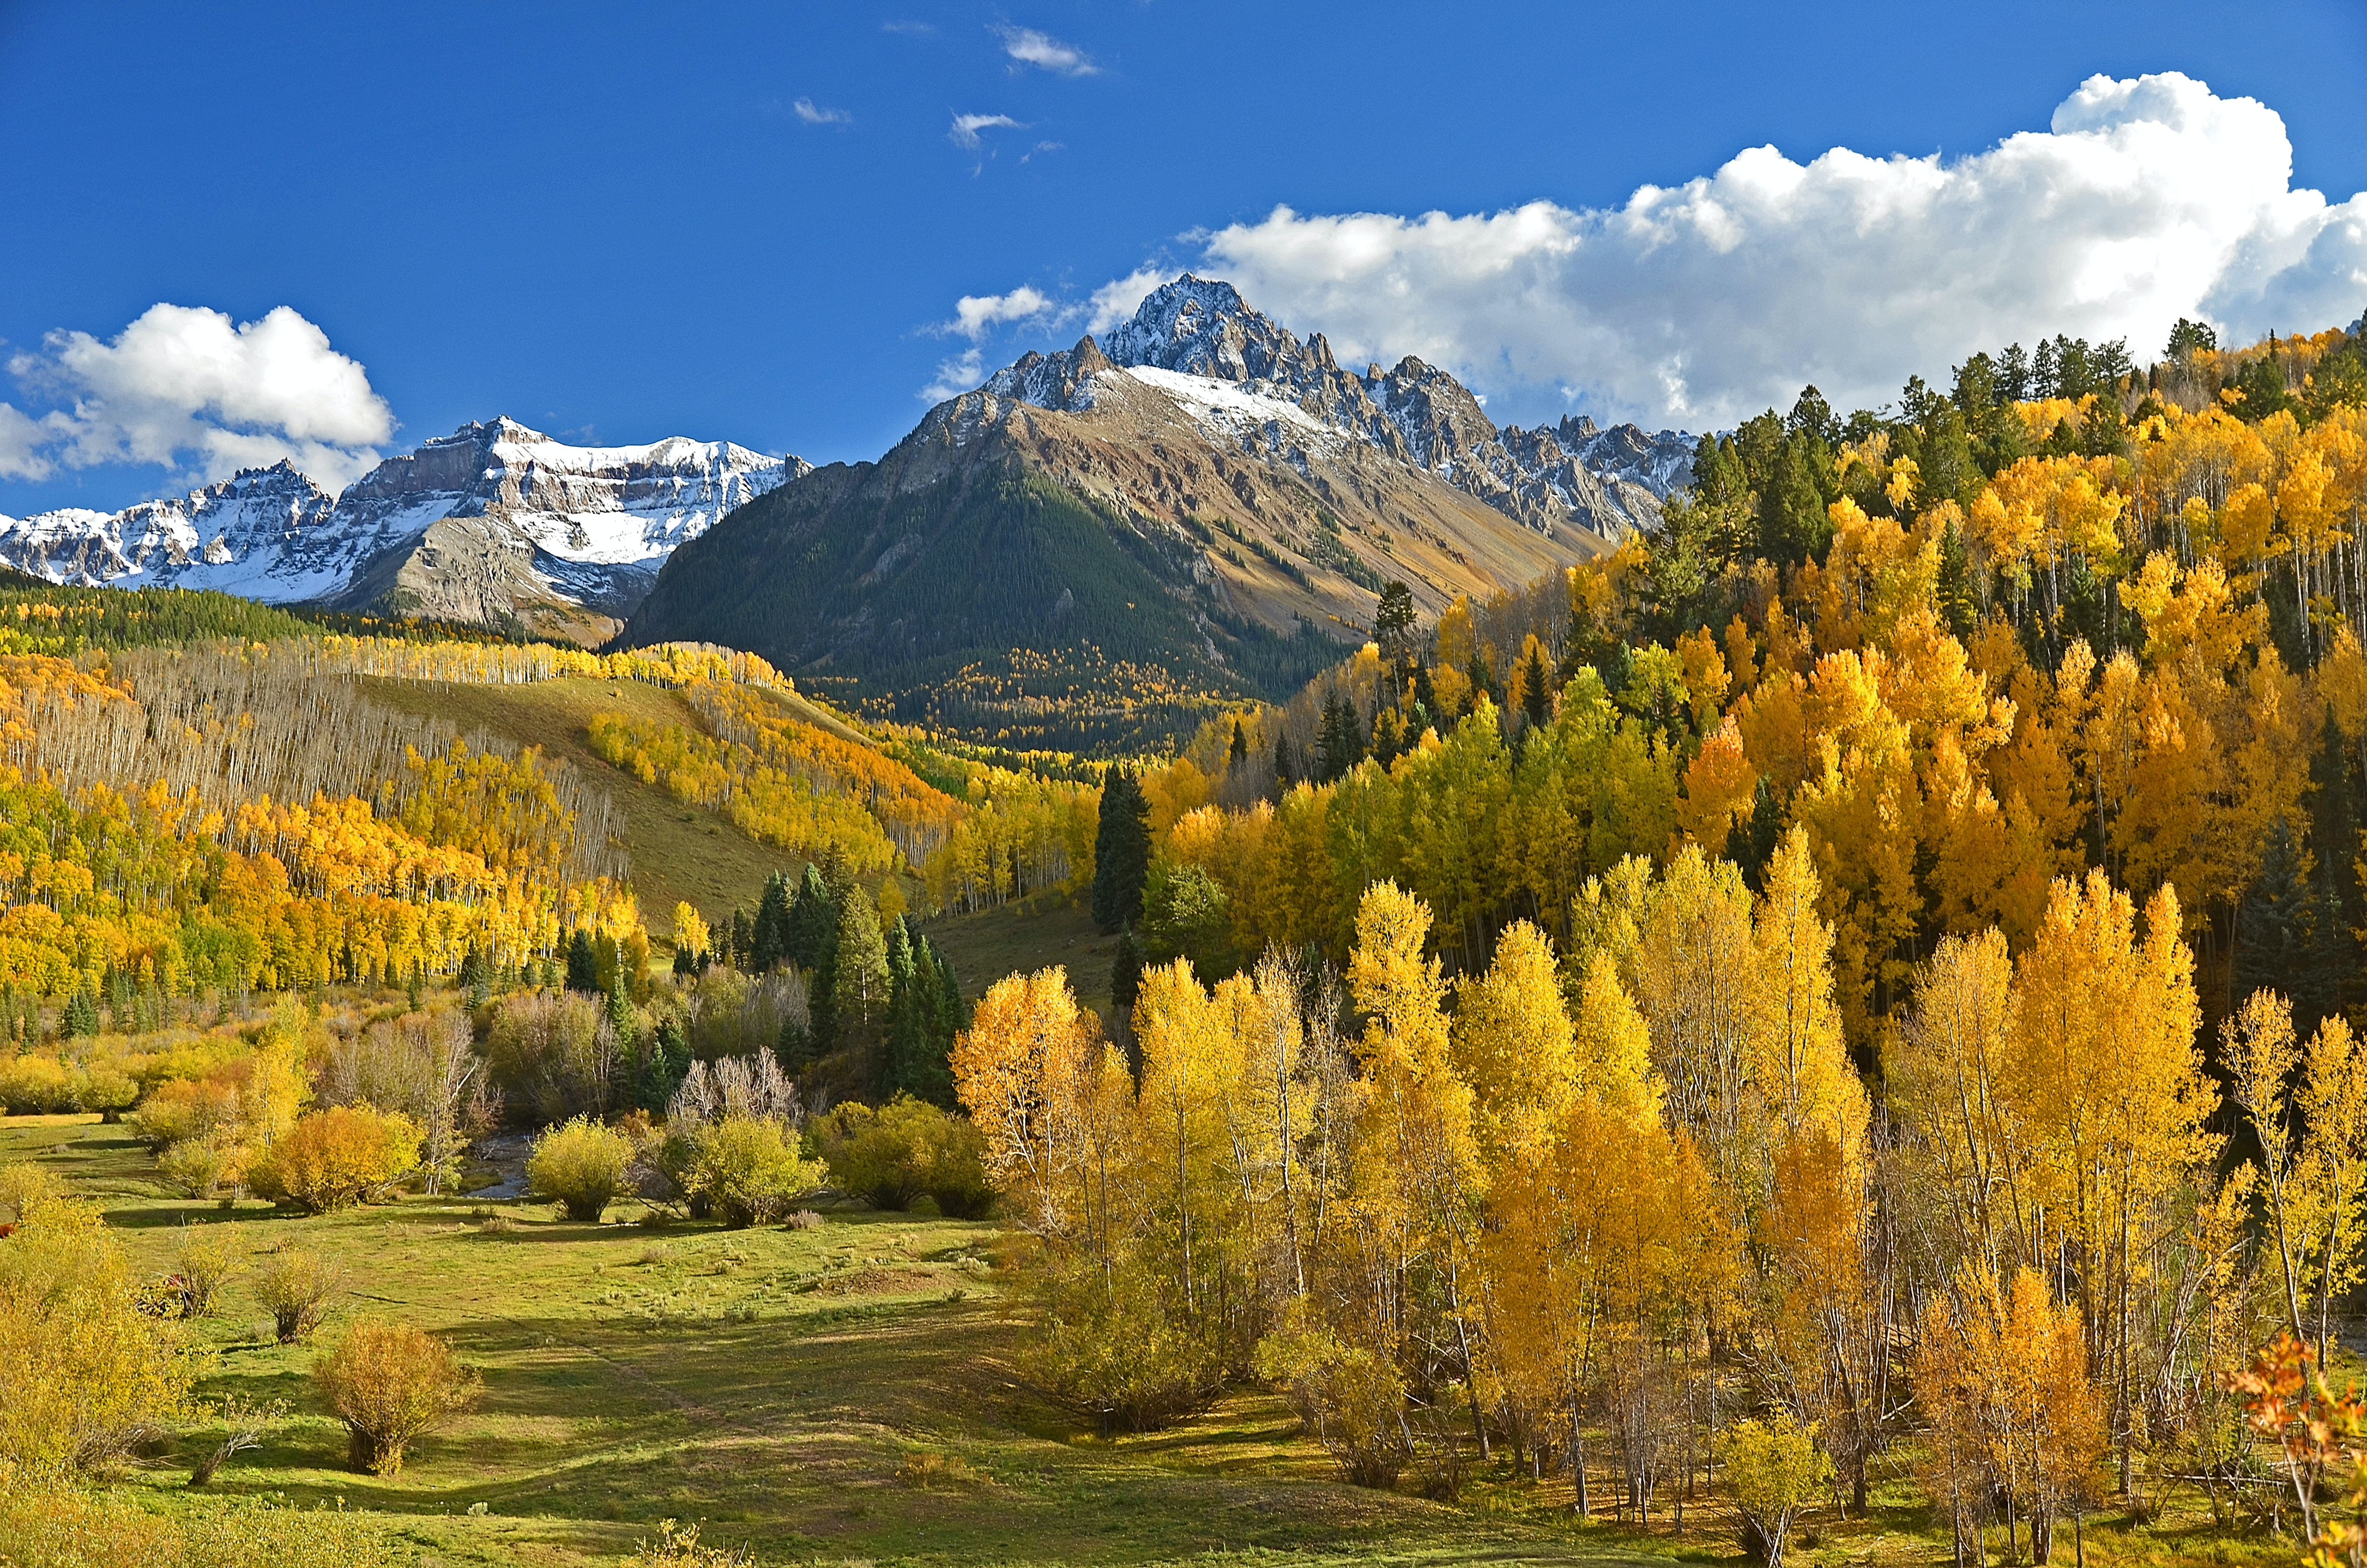 Rebecca Fassler Interests Background Yellow Mountain